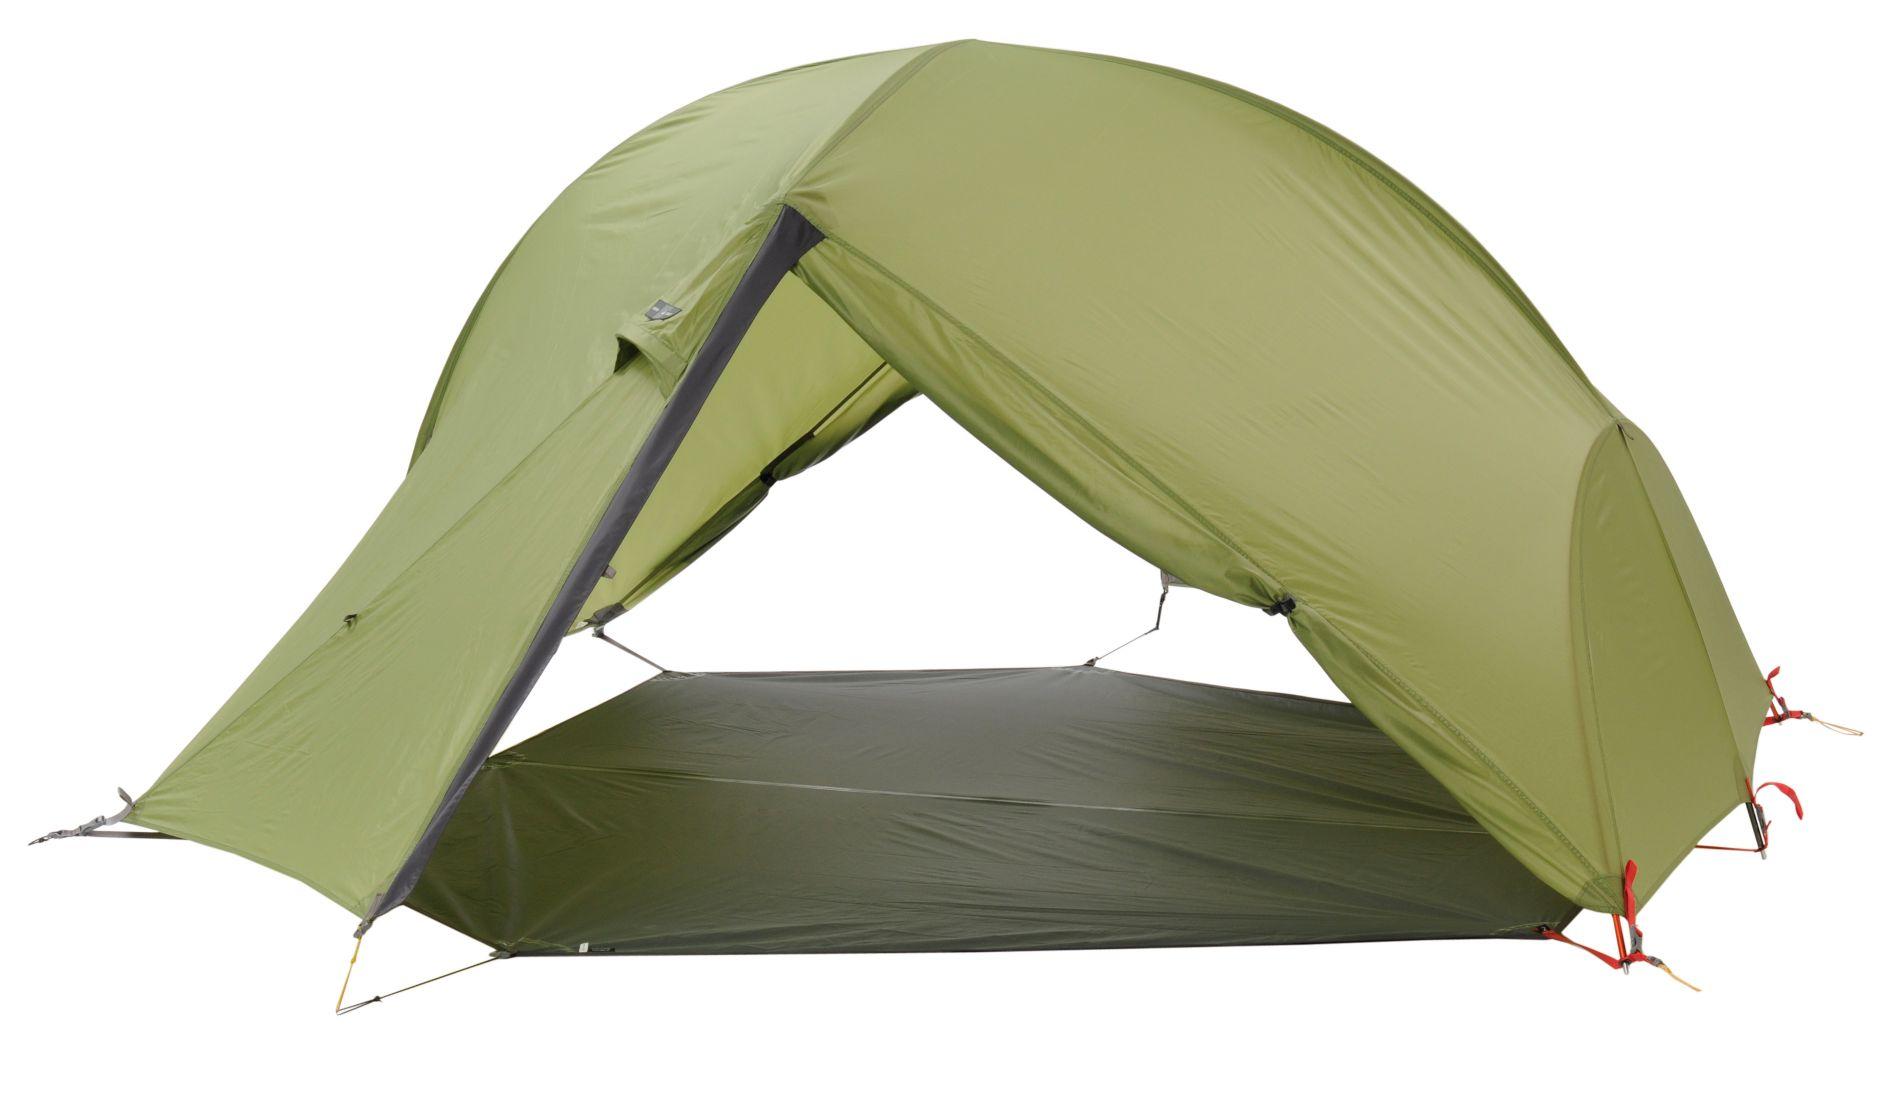 Tente ultra-légère Exped Mira II.